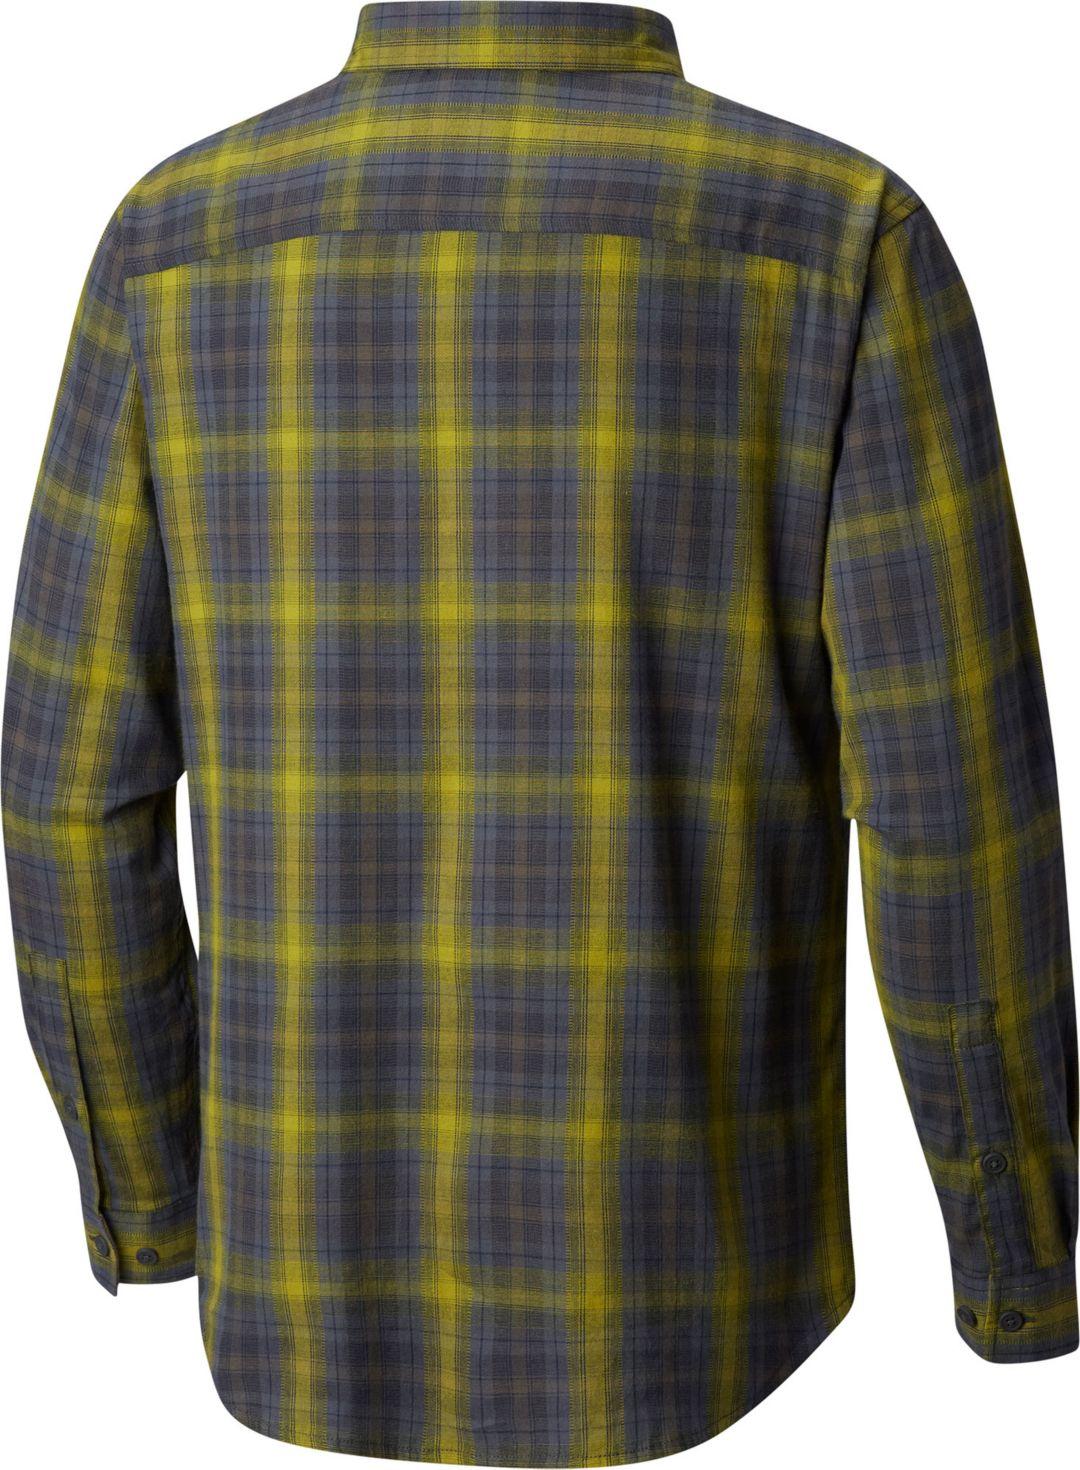 6d007fa963d Columbia Men's Cooper Lake Long Sleeve Shirt | DICK'S Sporting Goods